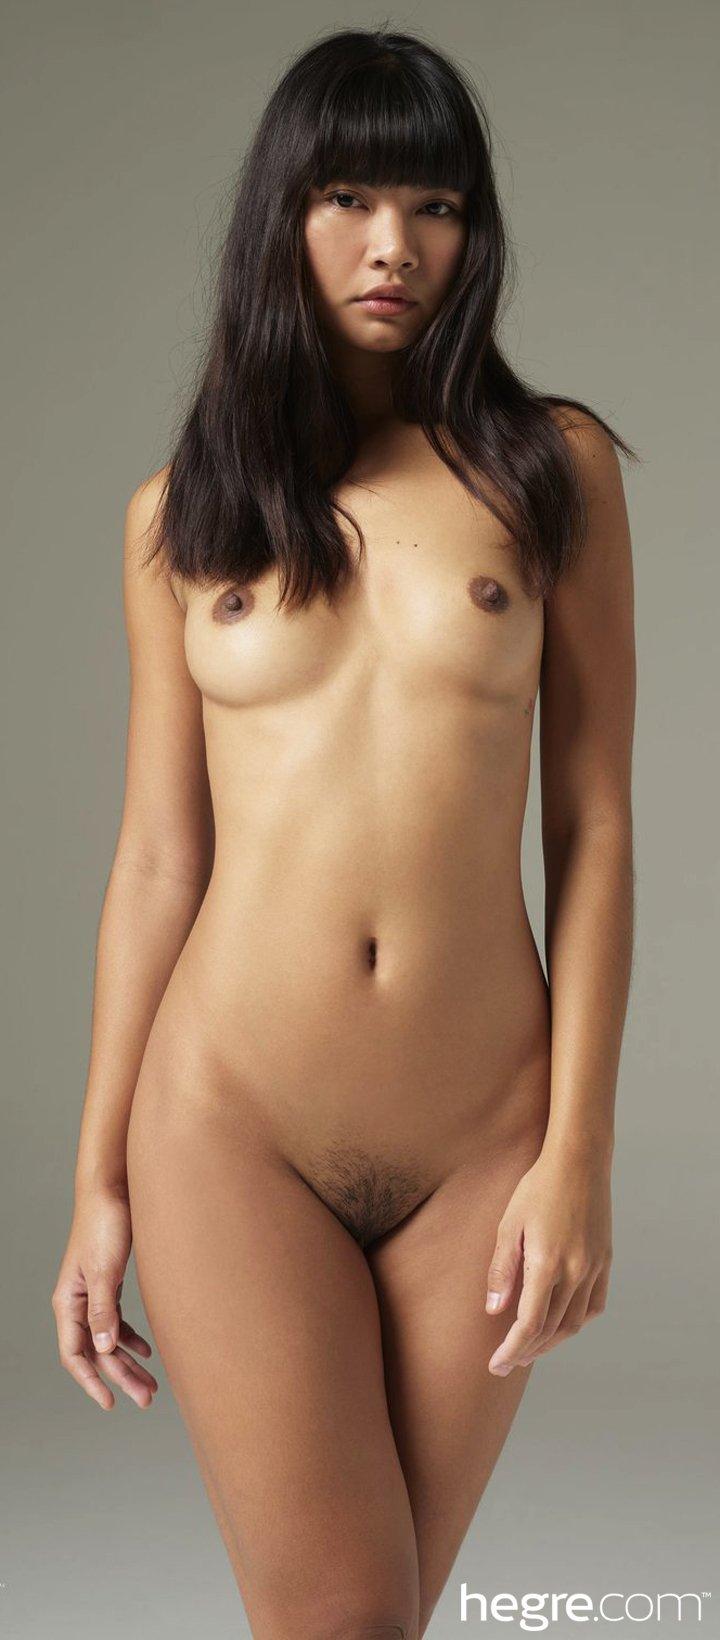 Thai beautiful girl Cara Pin posing completely naked